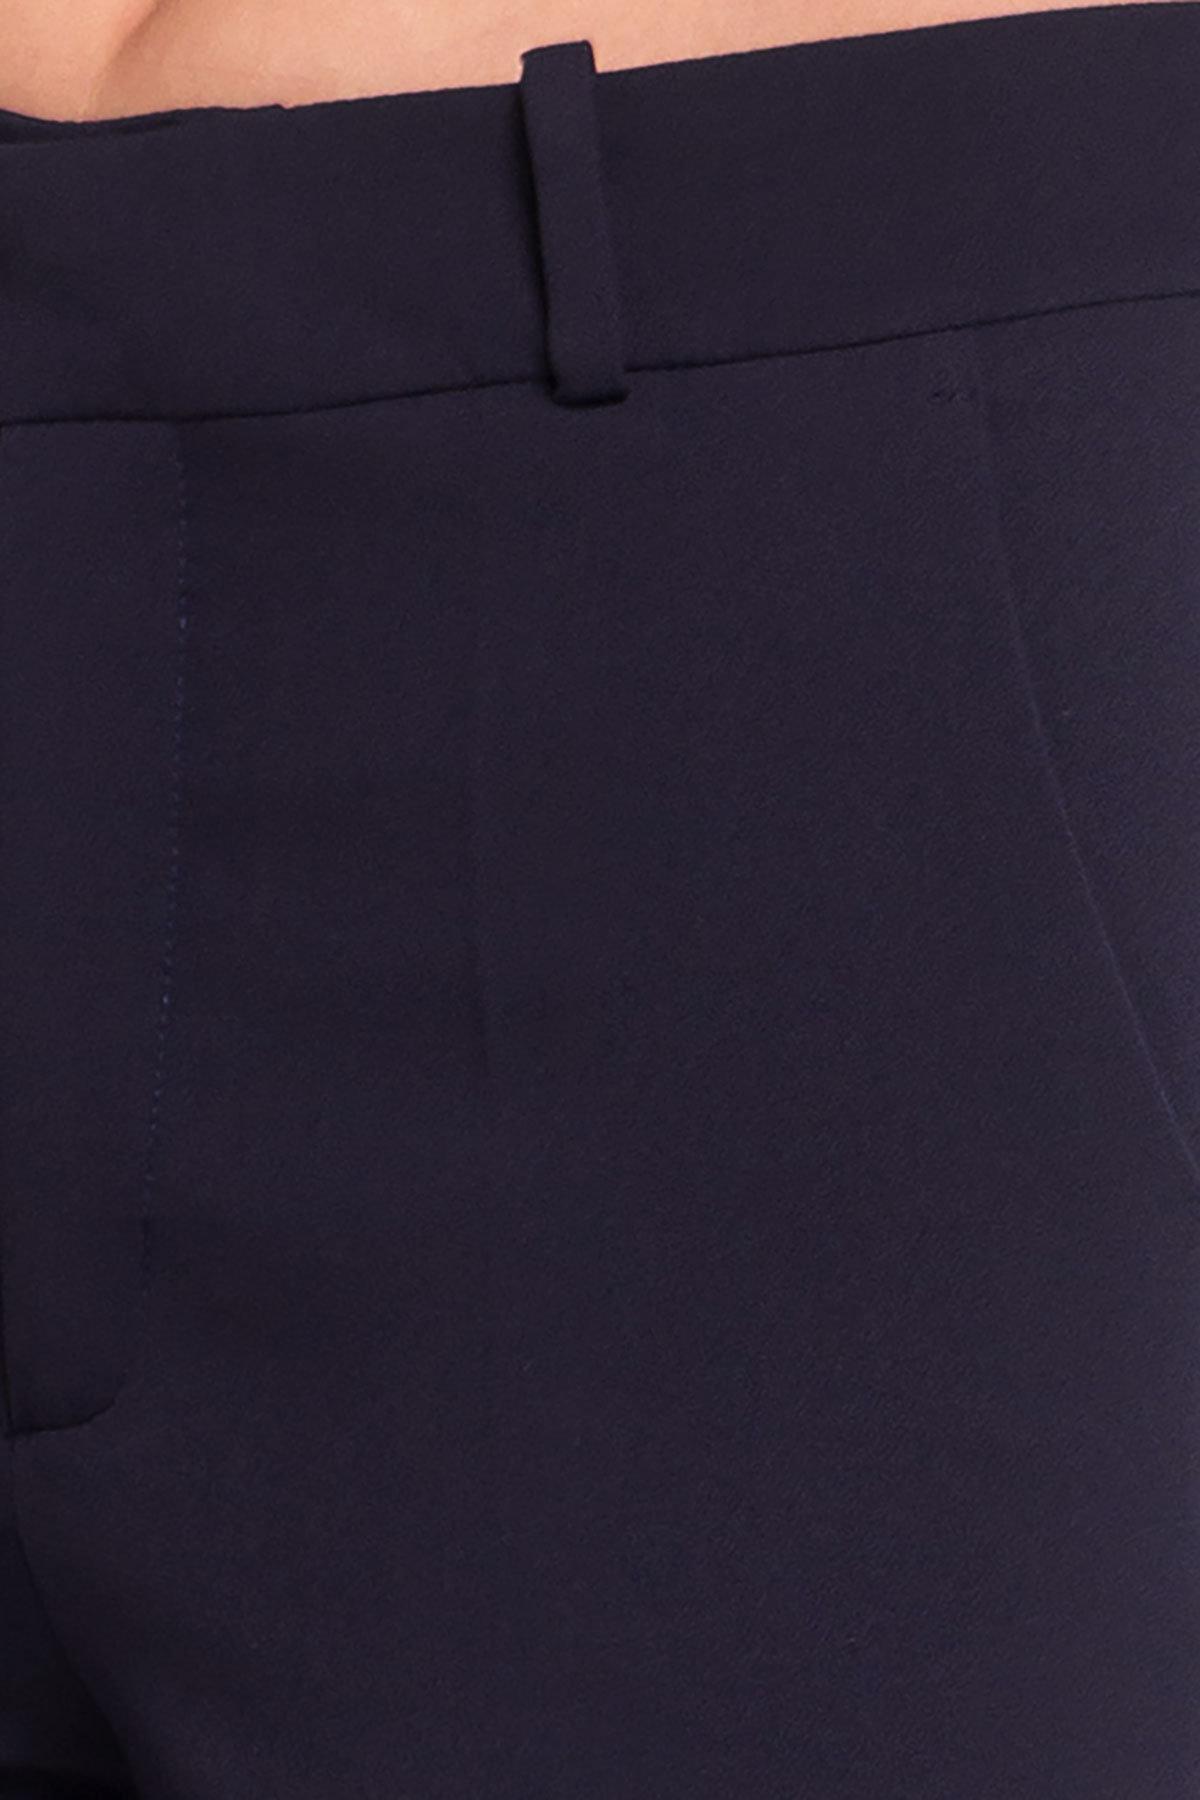 Брюки Макеба 3247 АРТ. 16724 Цвет: Темно-синий/белый - фото 4, интернет магазин tm-modus.ru